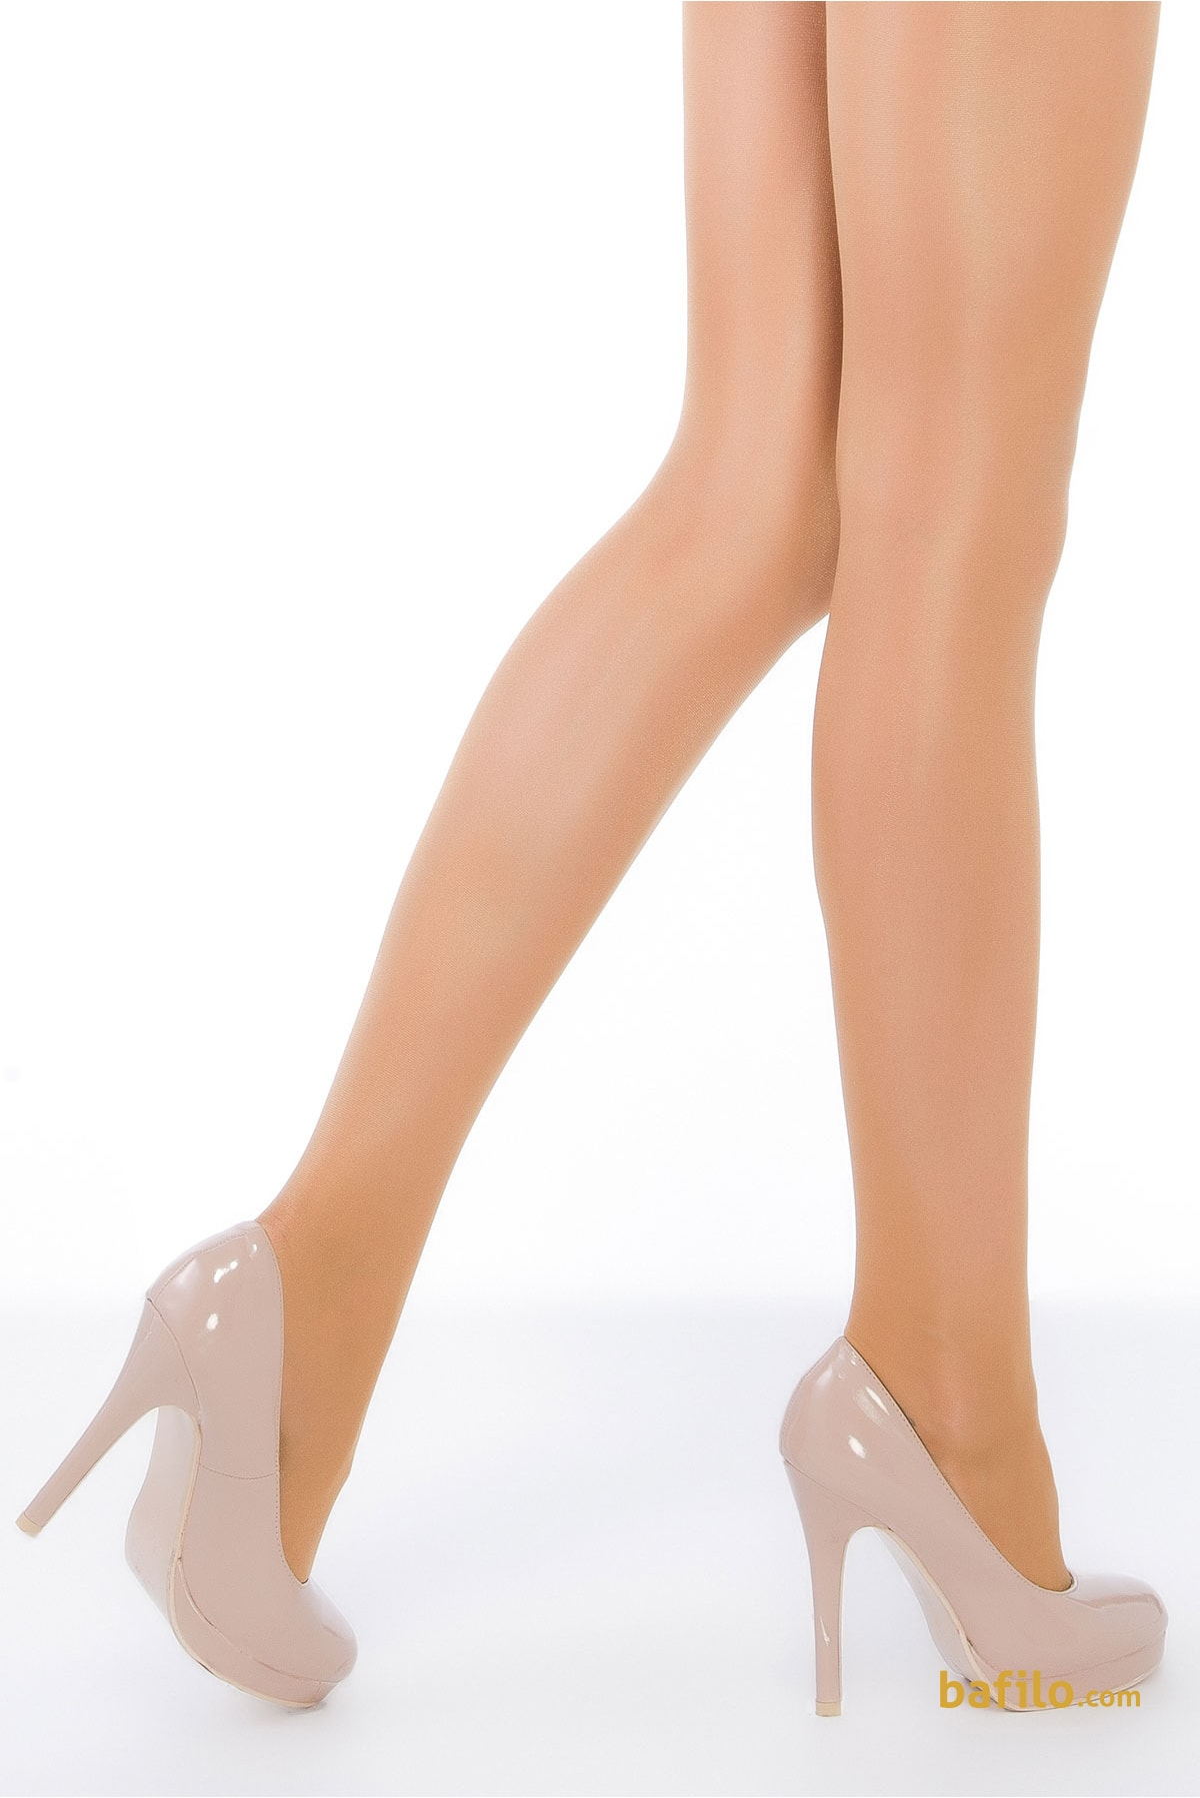 جوراب شلواری زنانه پنتی Fit 20 - رنگ بدن روشن |